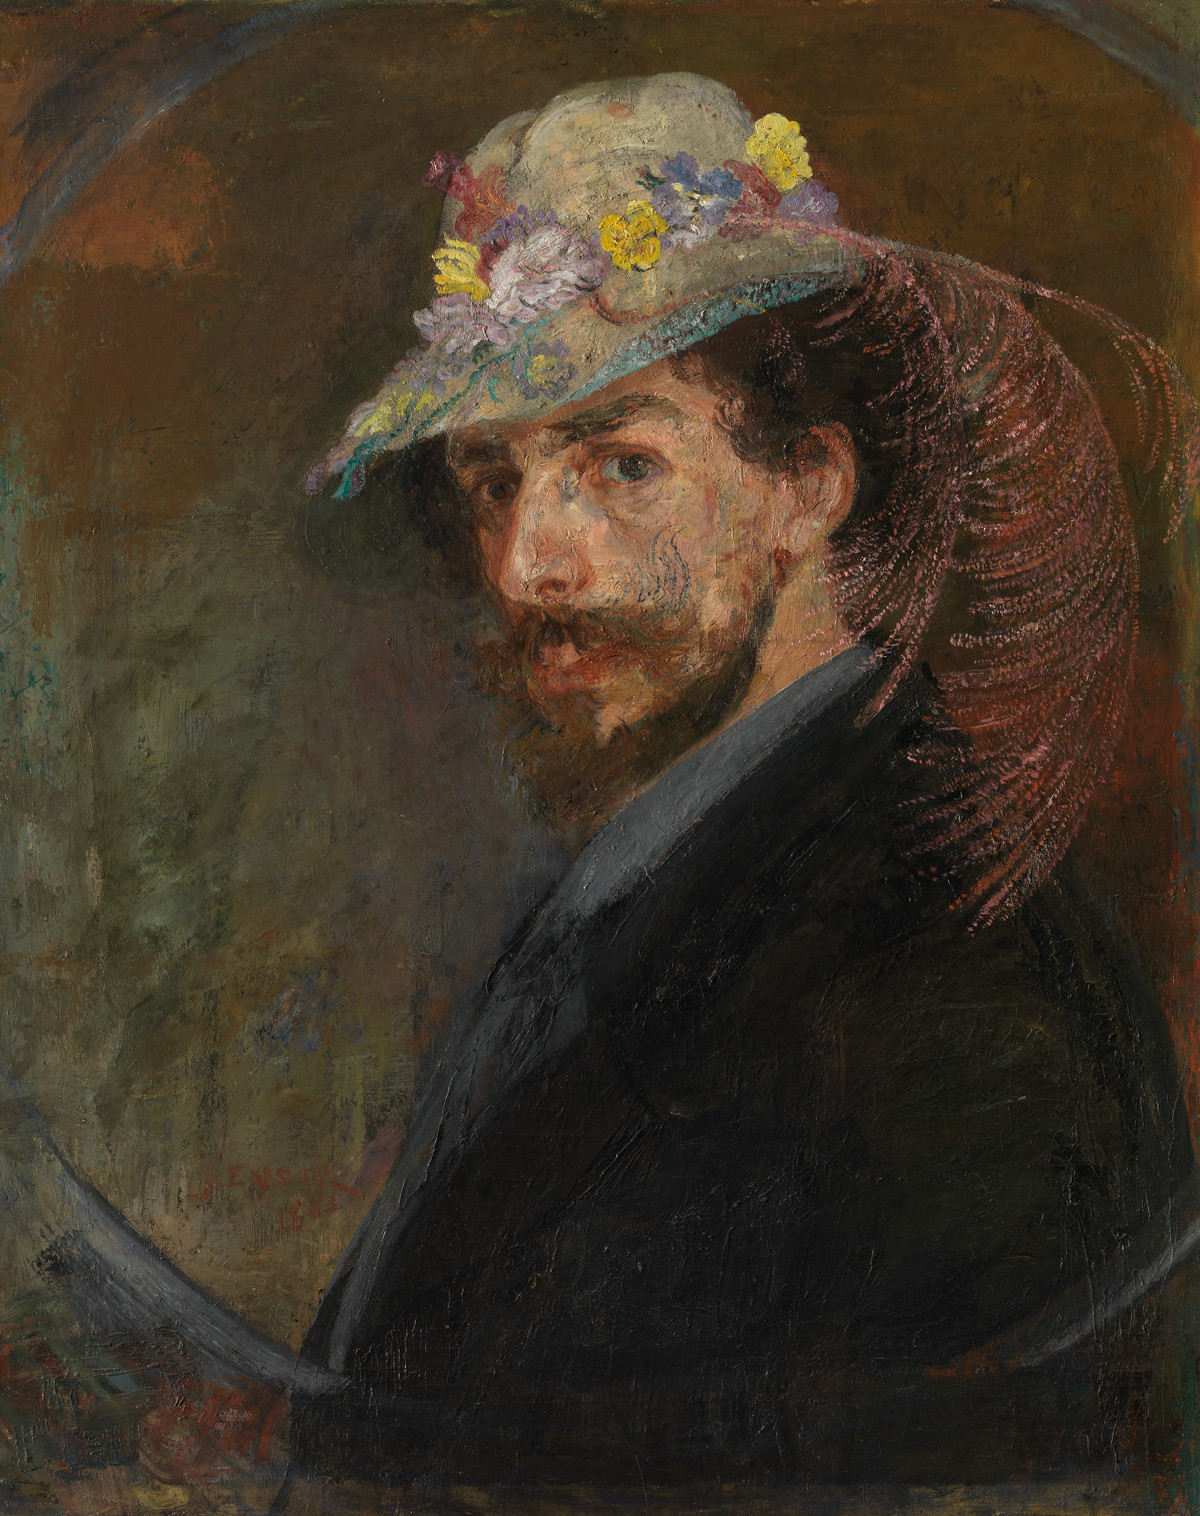 James Ensor, Self-portrait with Flowered Hat, 1883, oil on canvas, 76.5 x 61.5 cm (Photo Mu.ZEE © www.lukasweb.be - Art in Flanders vzw, photography: Hugo Maertens / © DACS 2016)